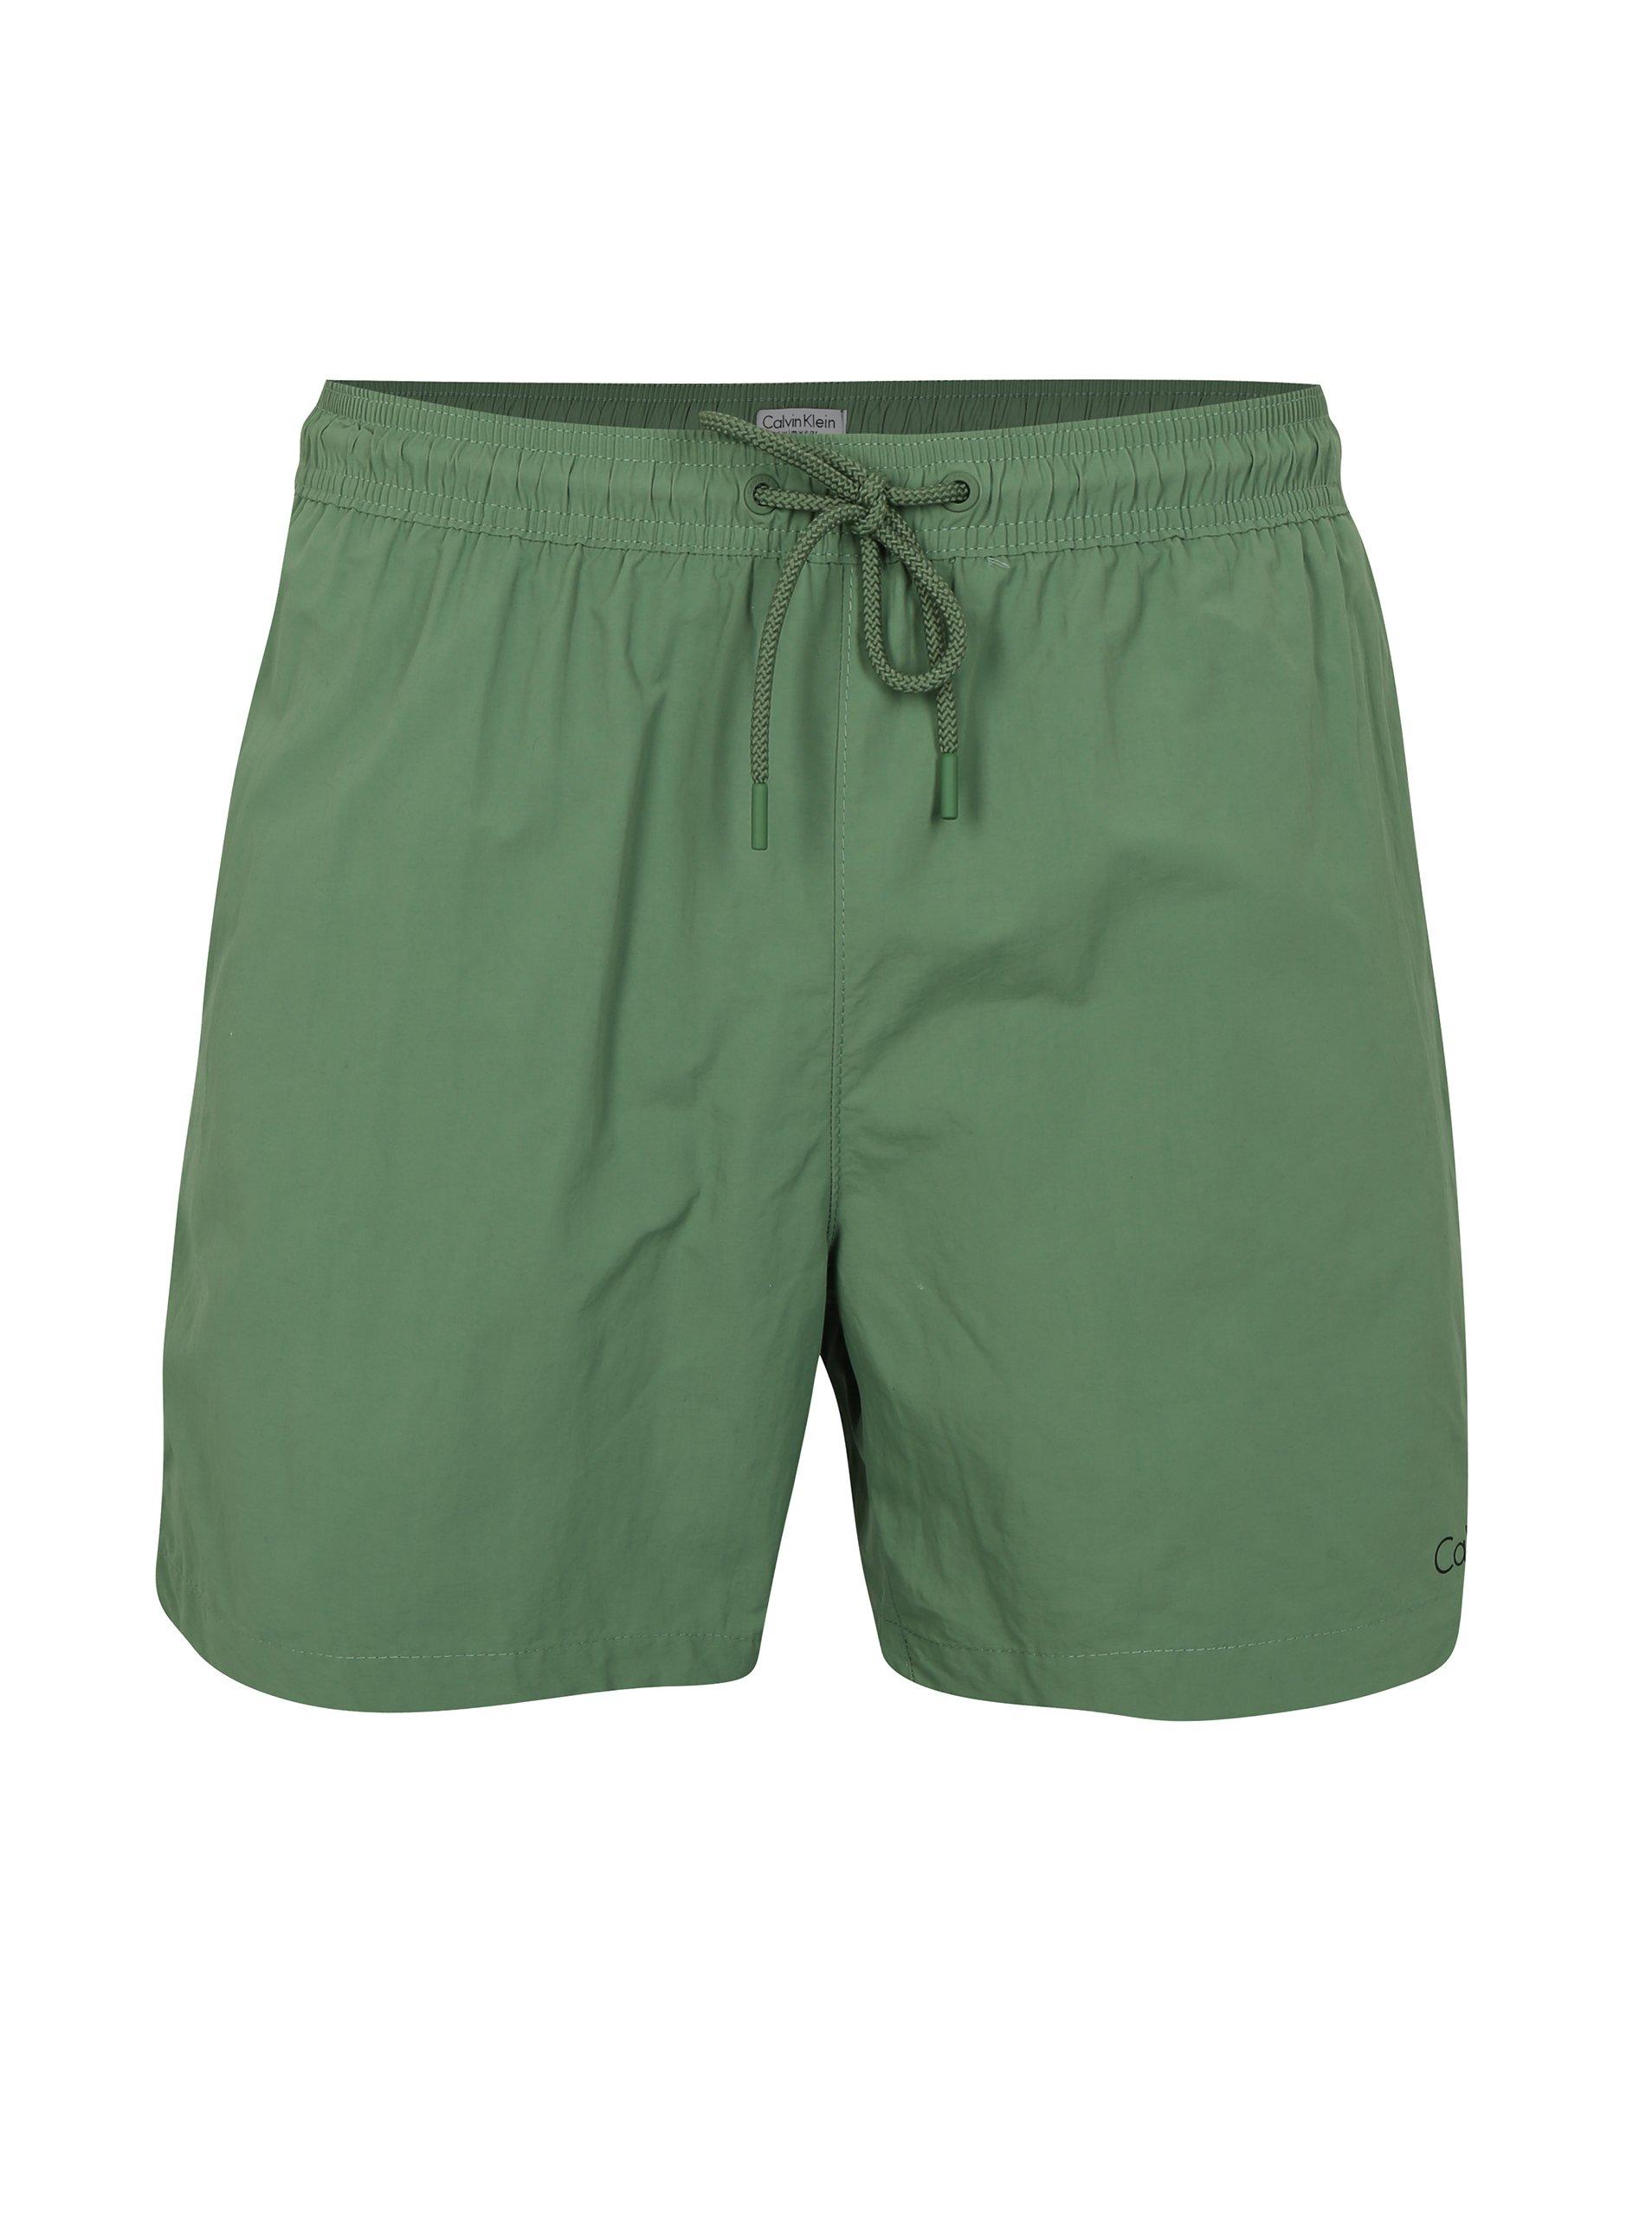 86e53d310edb Zelené pánske plavky Calvin Klein